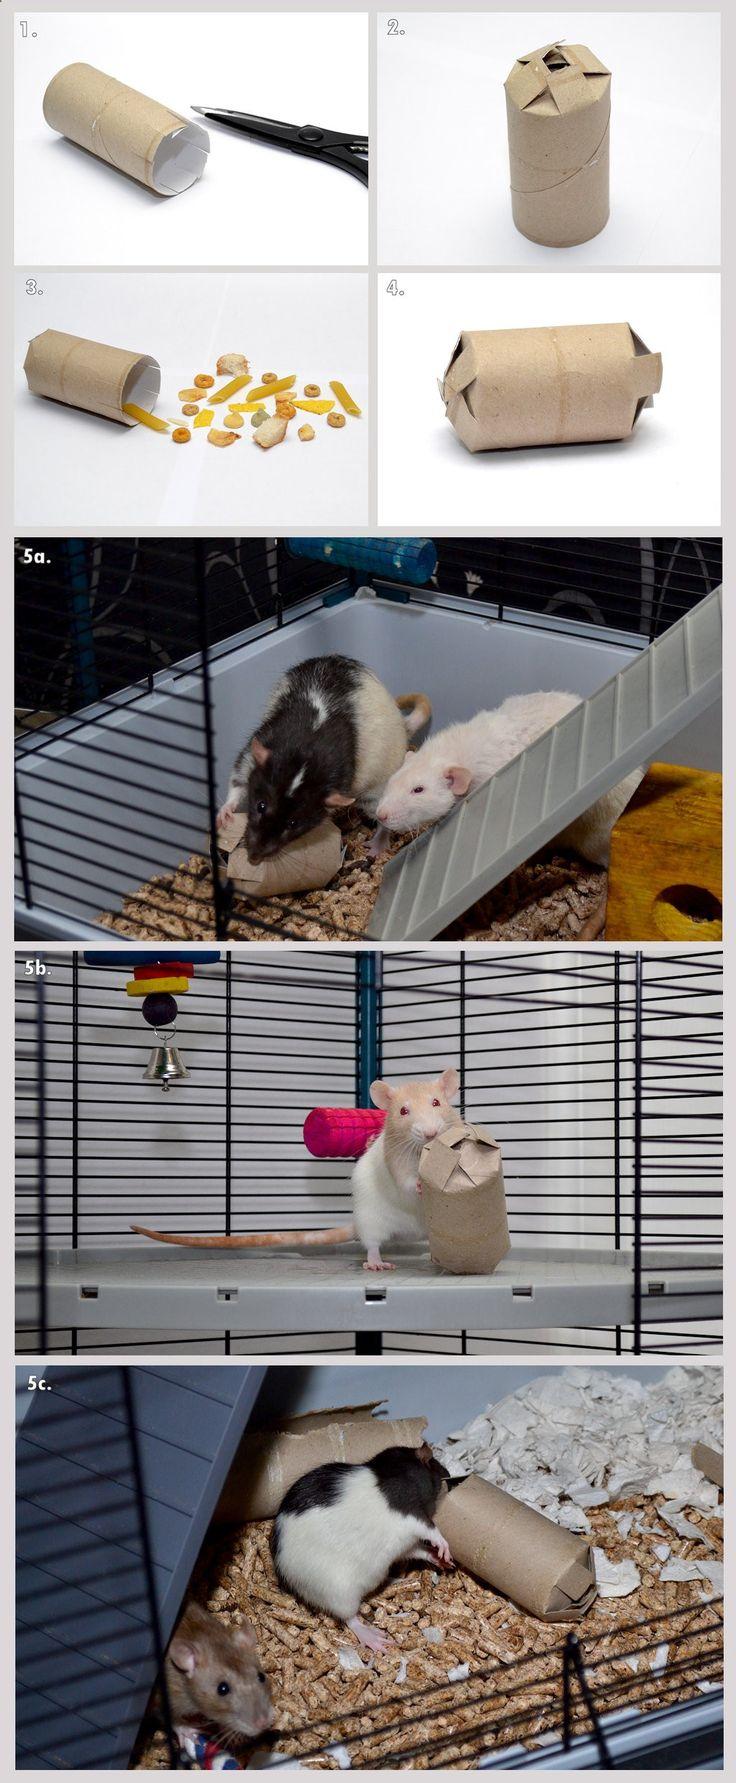 Cats Toys Ideas - Rat toy tutorial - Treat Box (Pinata) (by LadyTara on deviantART) #rats #tutorial - Ideal toys for small cats